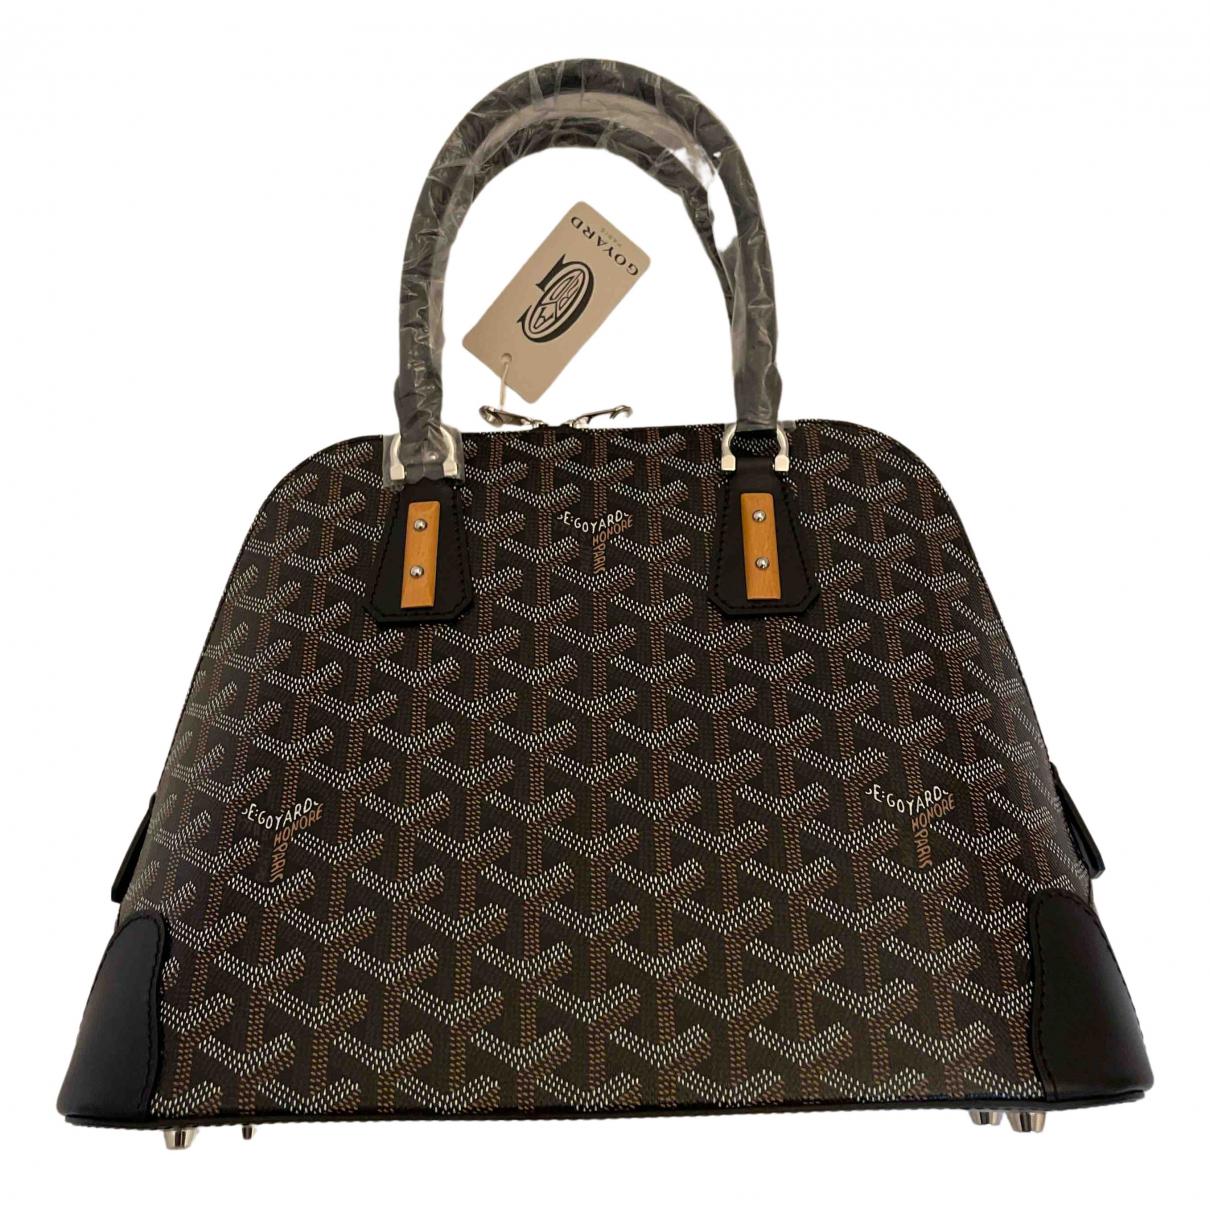 Goyard Vendôme cloth handbag